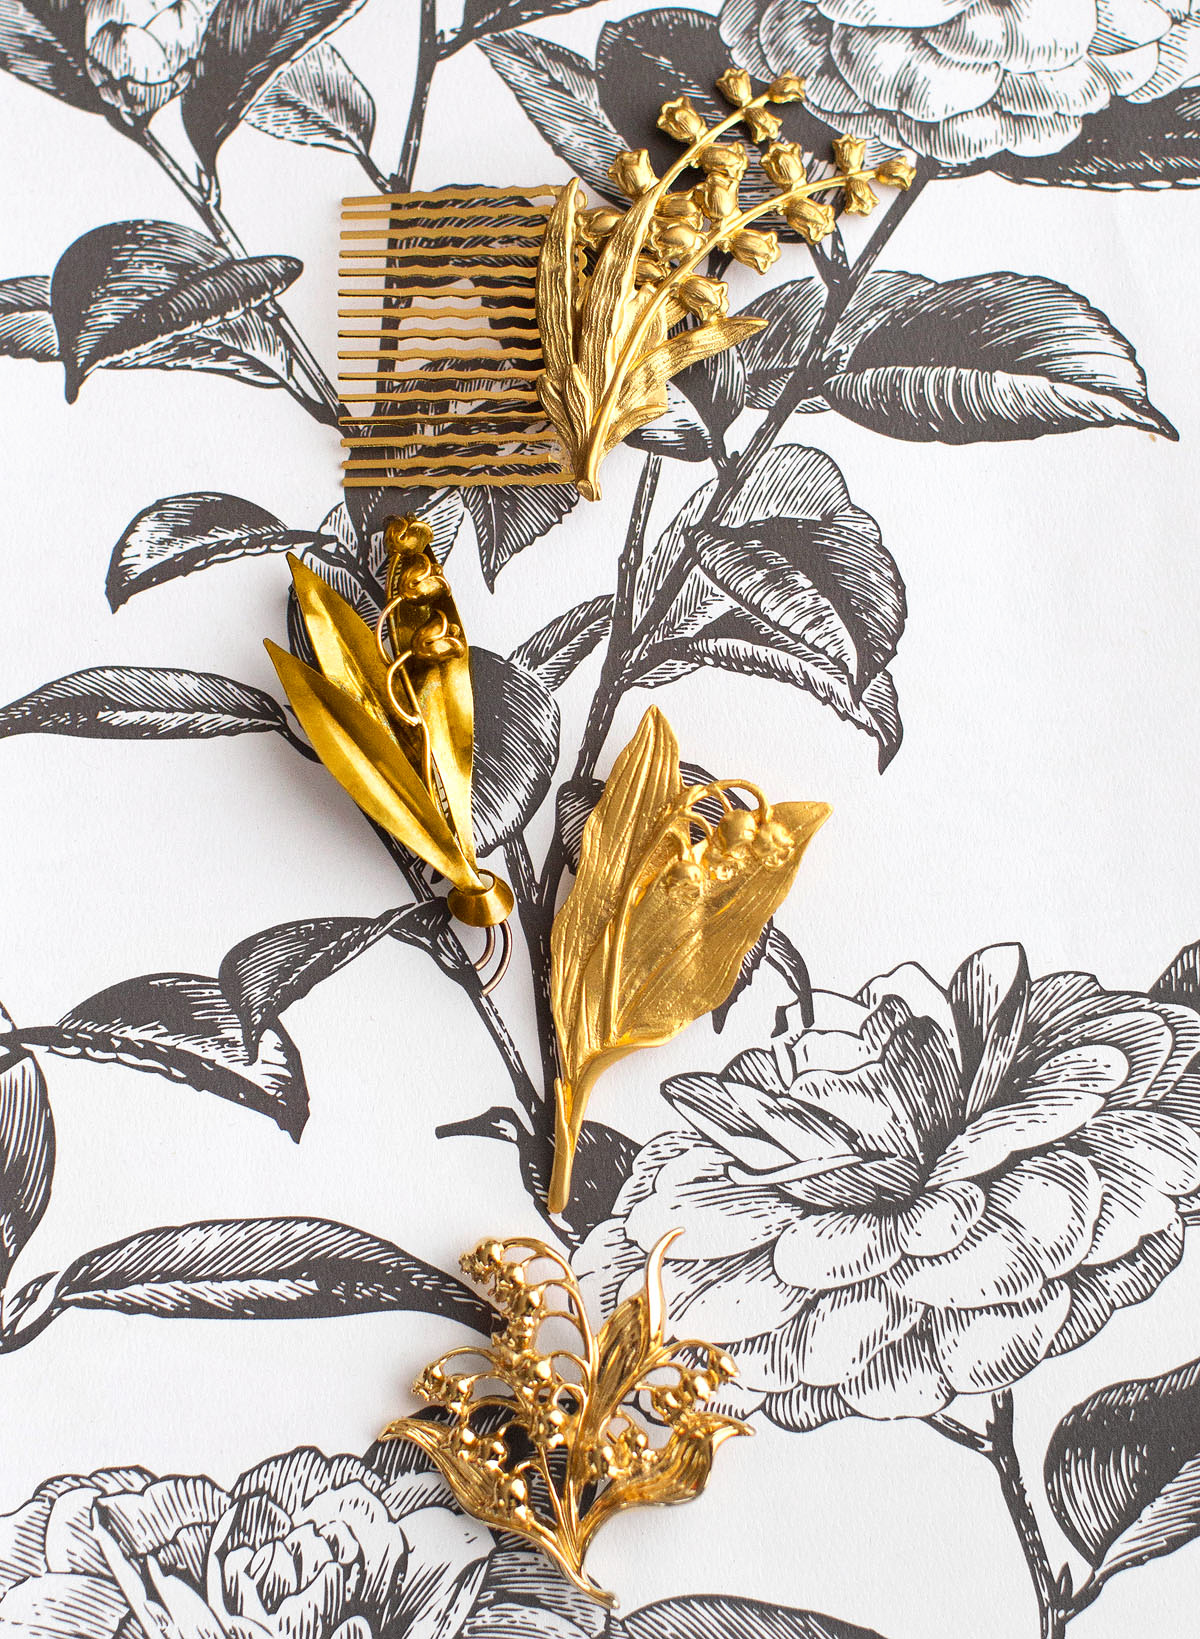 gold combs